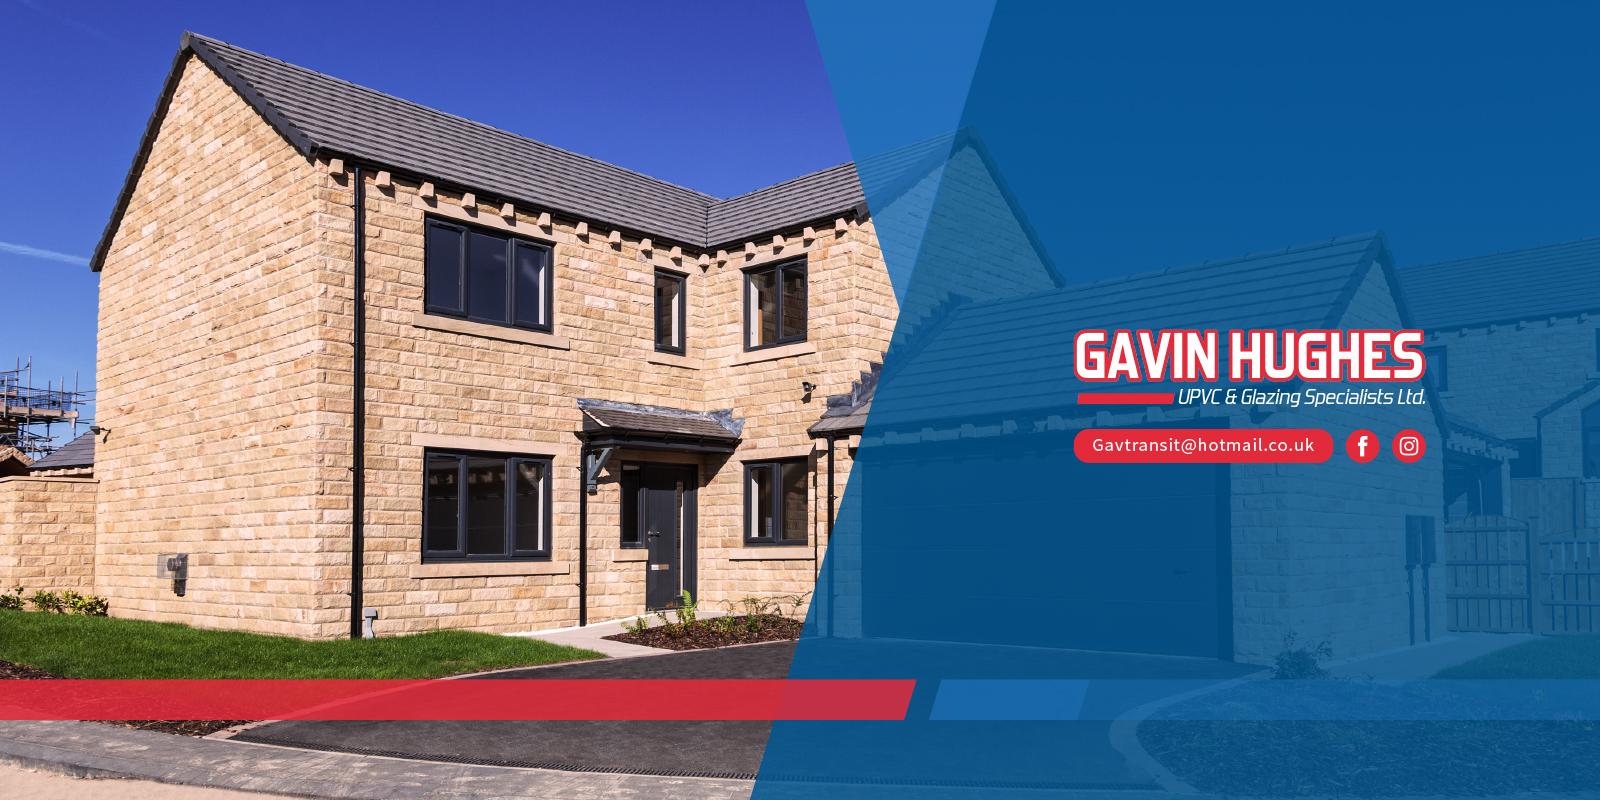 Gavin Hughes UPVC windows and composite doors main hero image